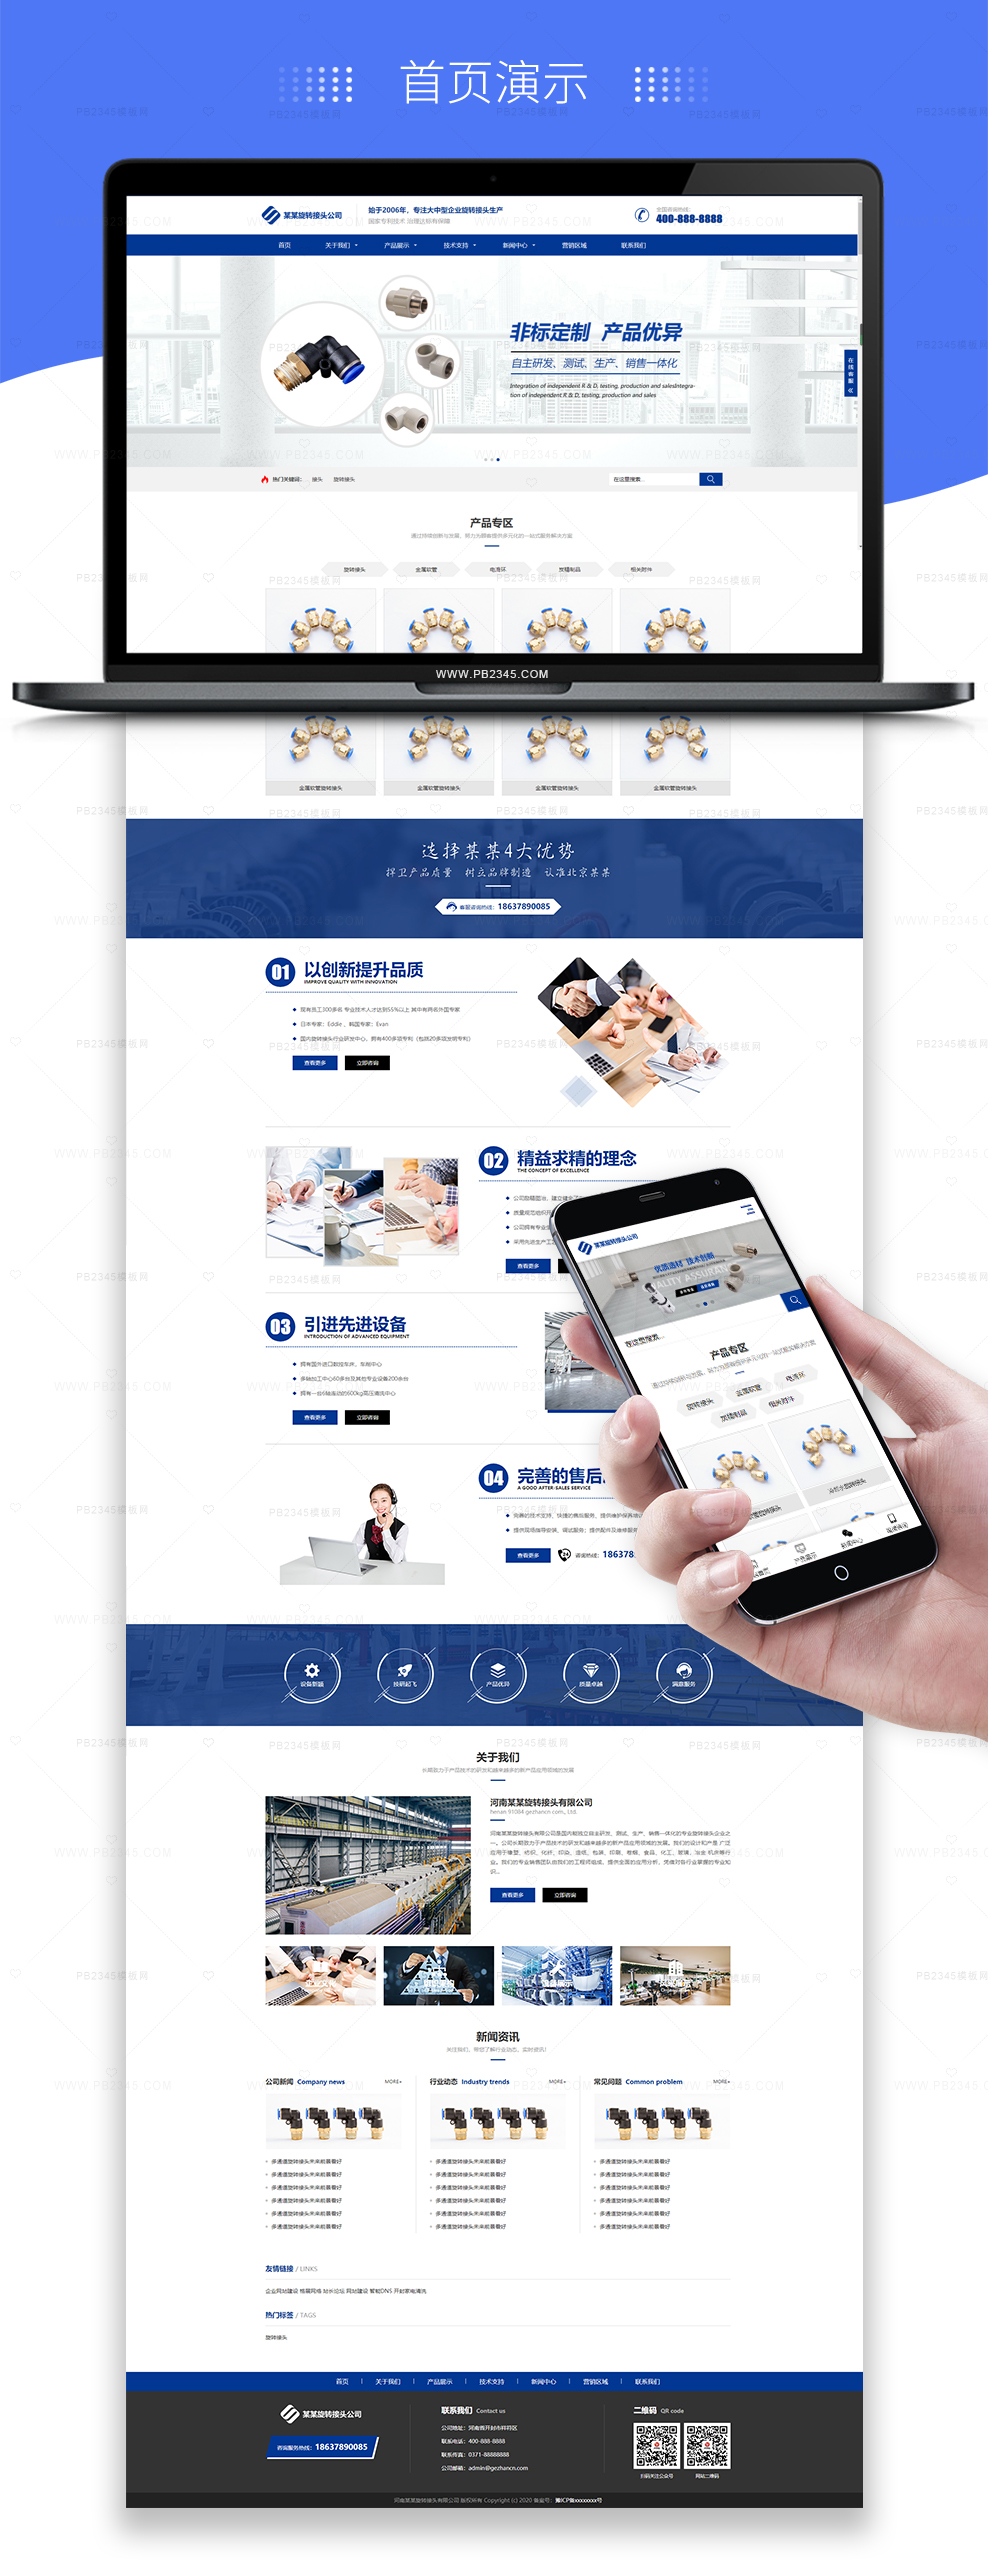 pbootcms营销型机械电子五金自适应网站模板源码